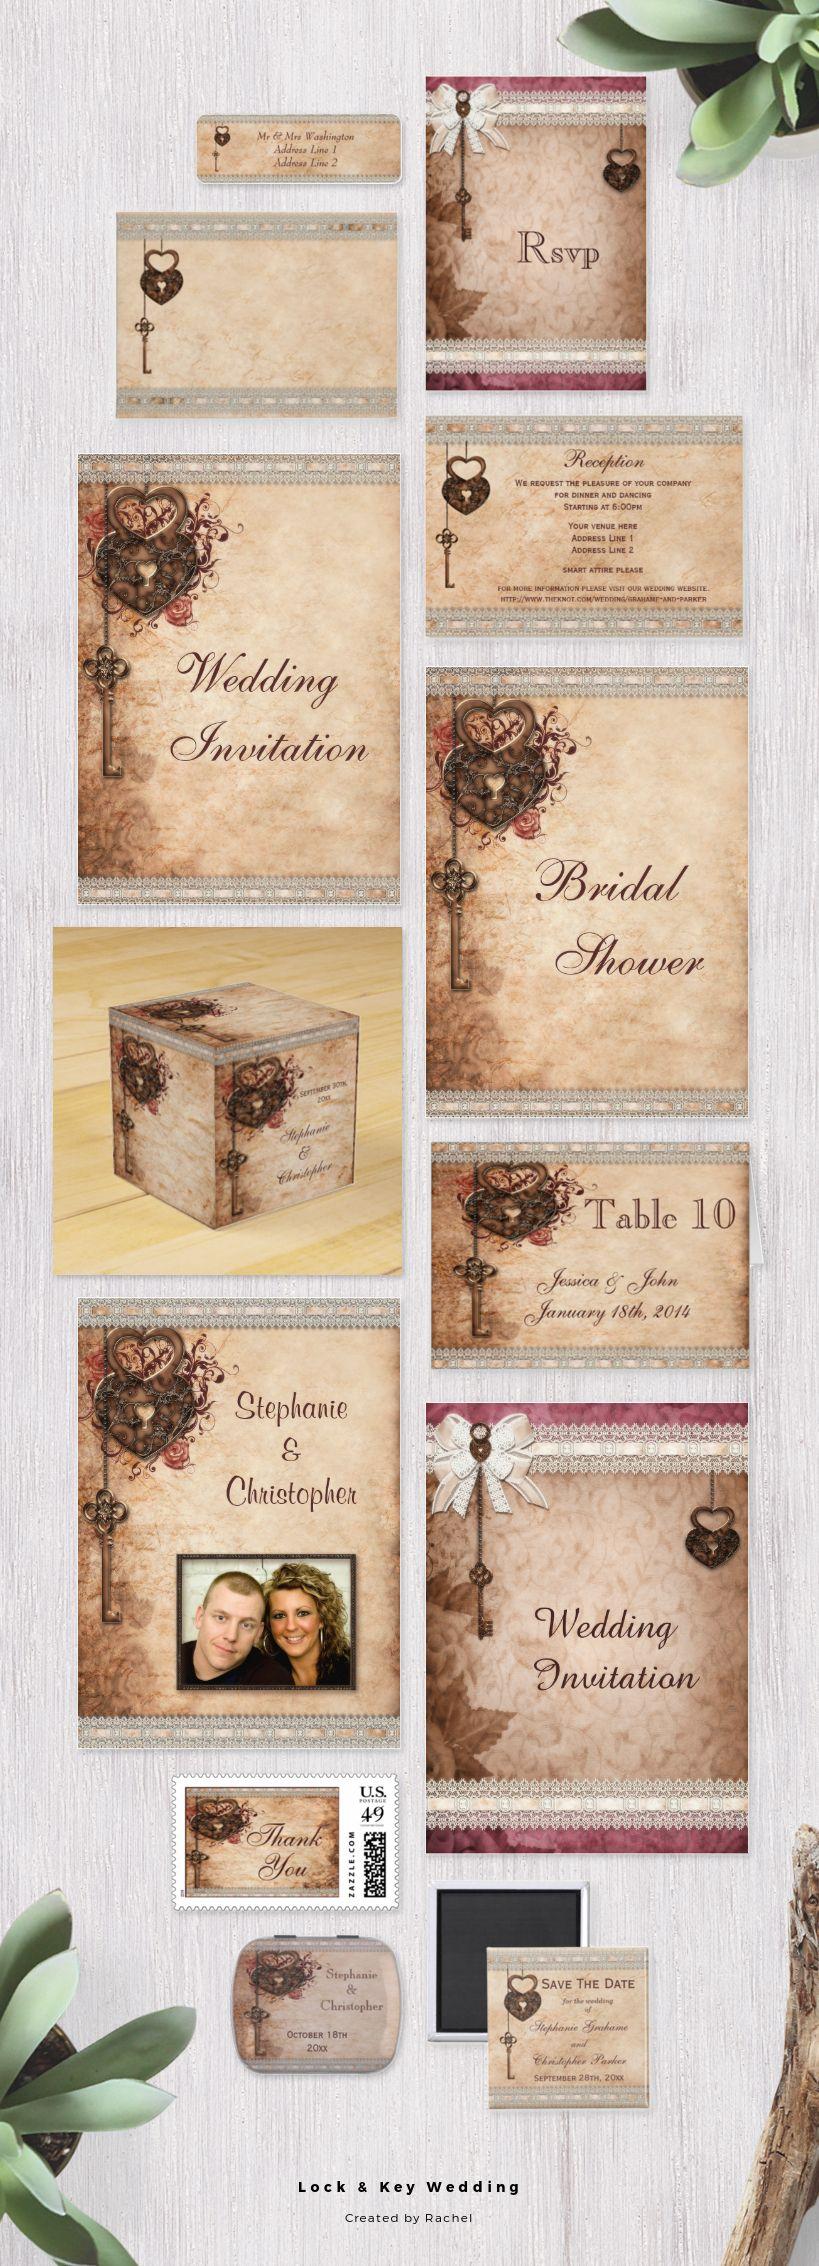 Elegant Fall Themed Key And Locks Wedding Invitations And Favors